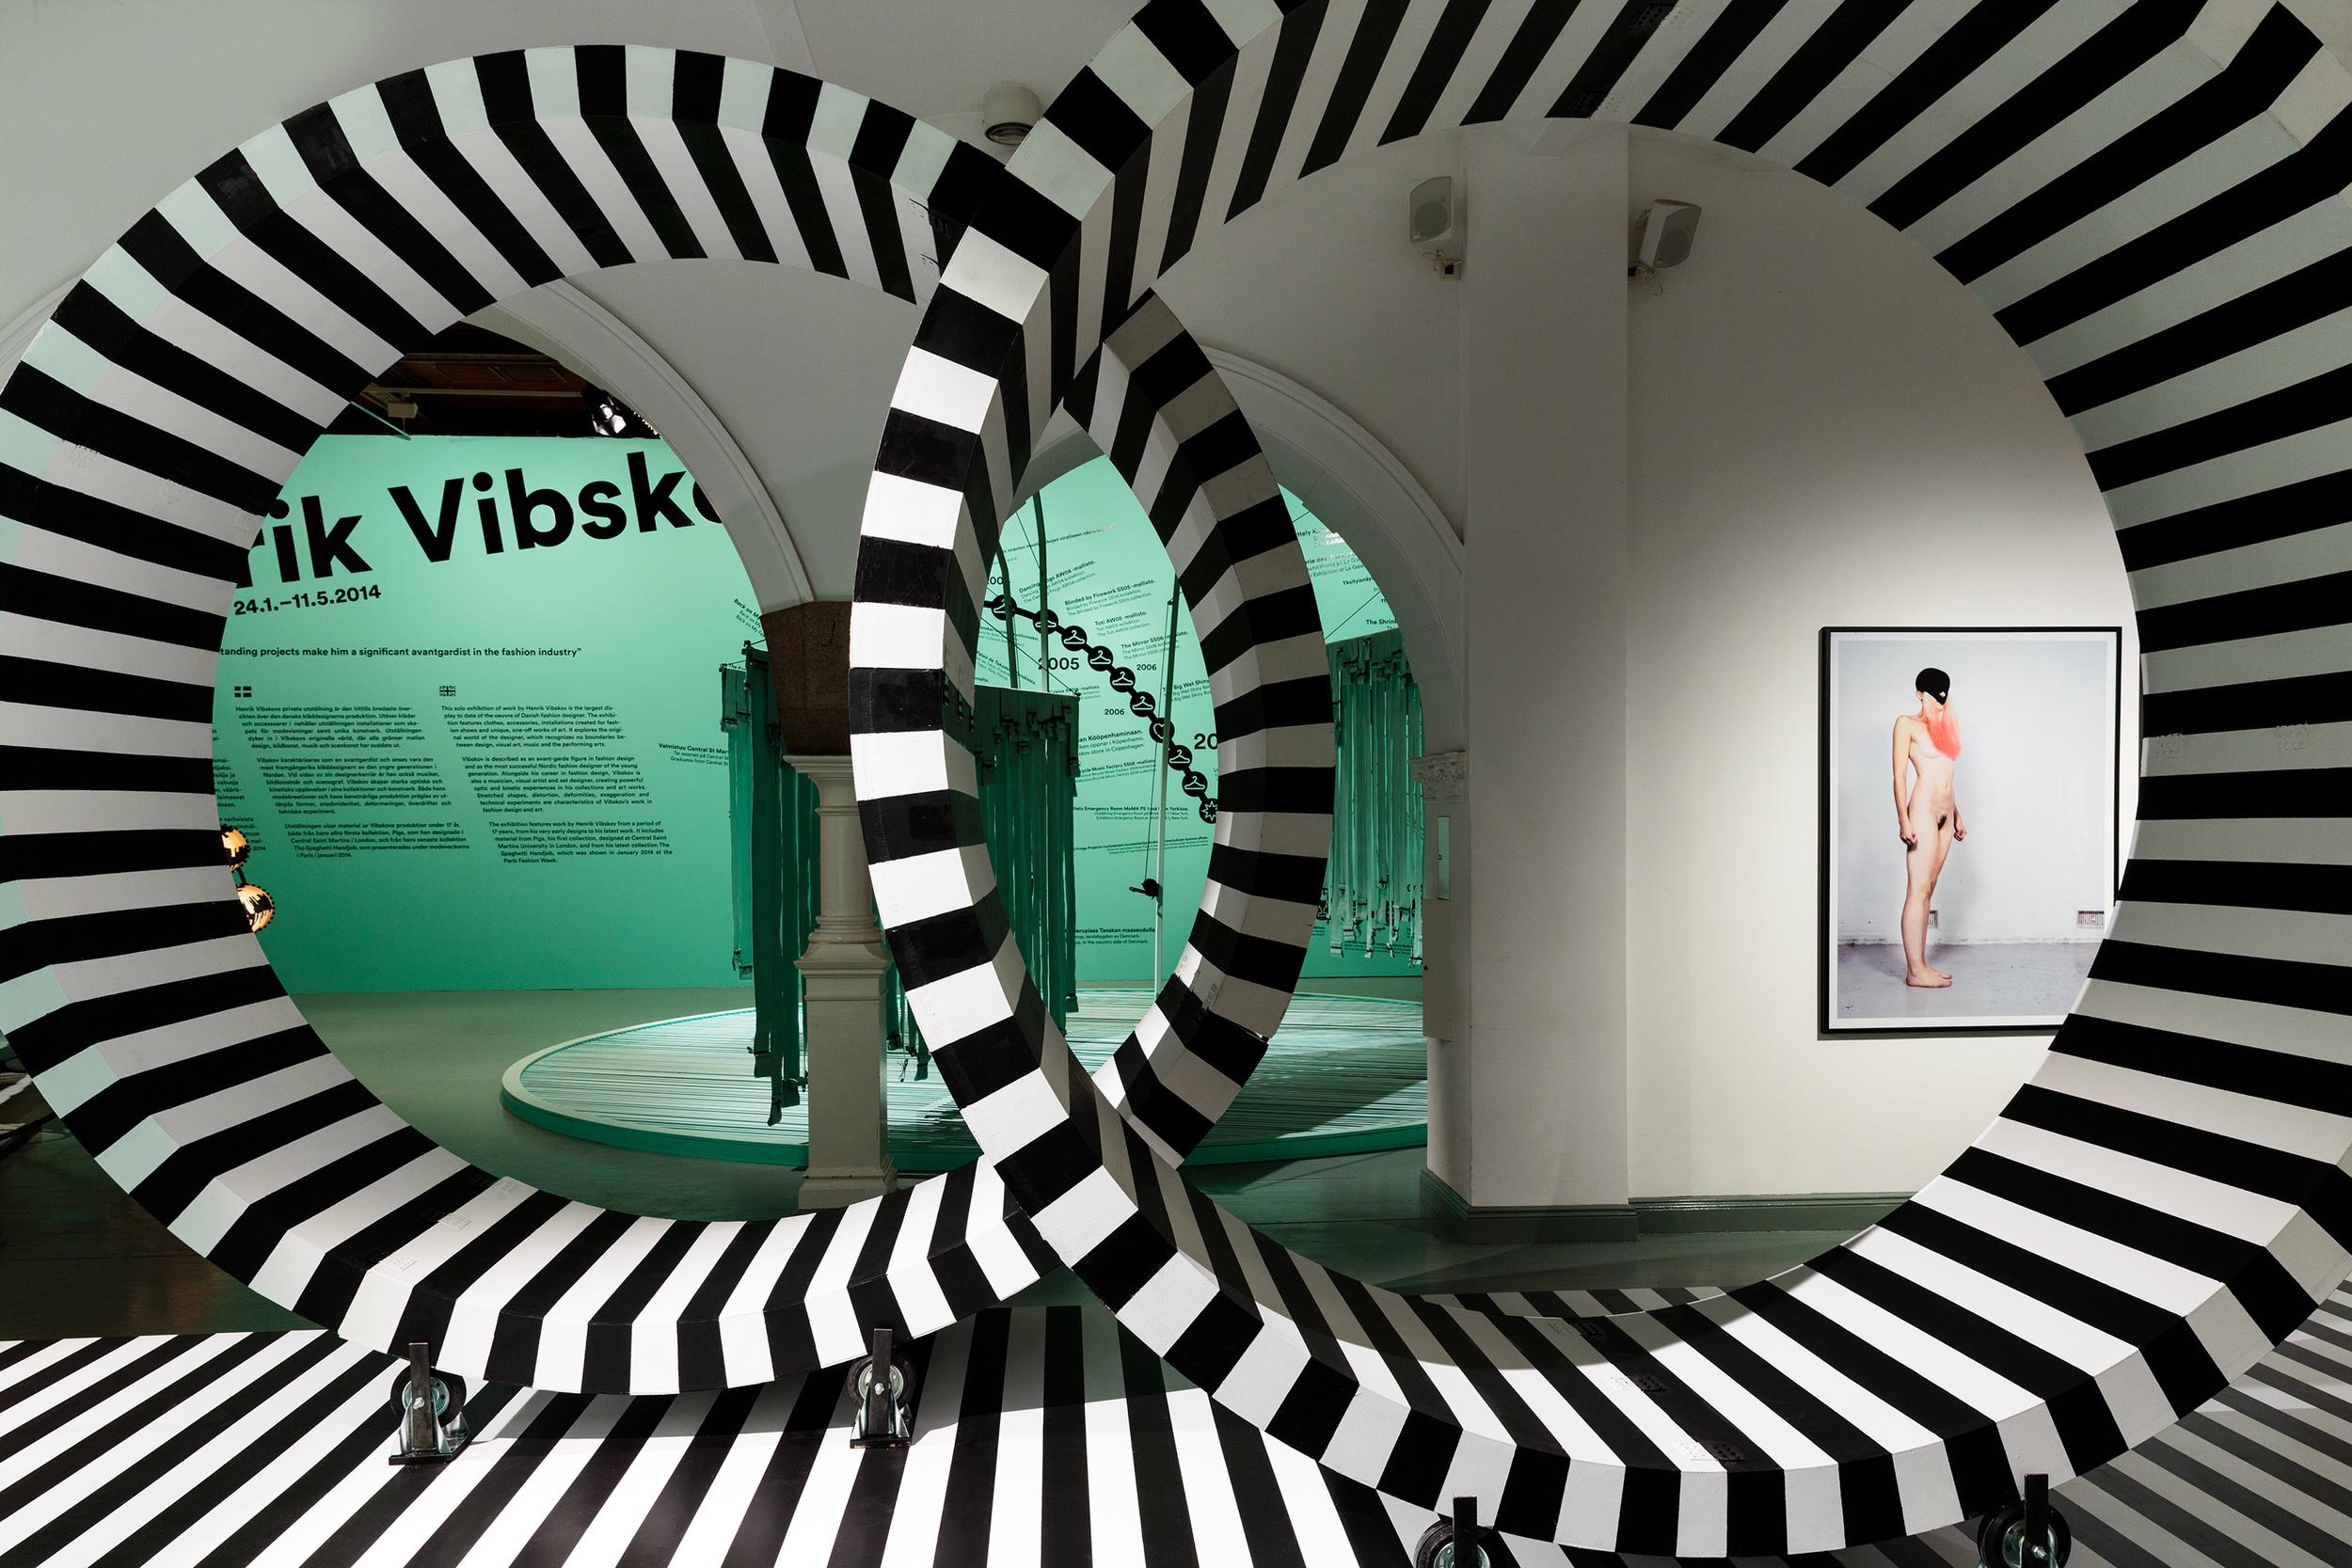 Henrik Vibskov, installation view, 2014 (c) Paavo Lehtonen